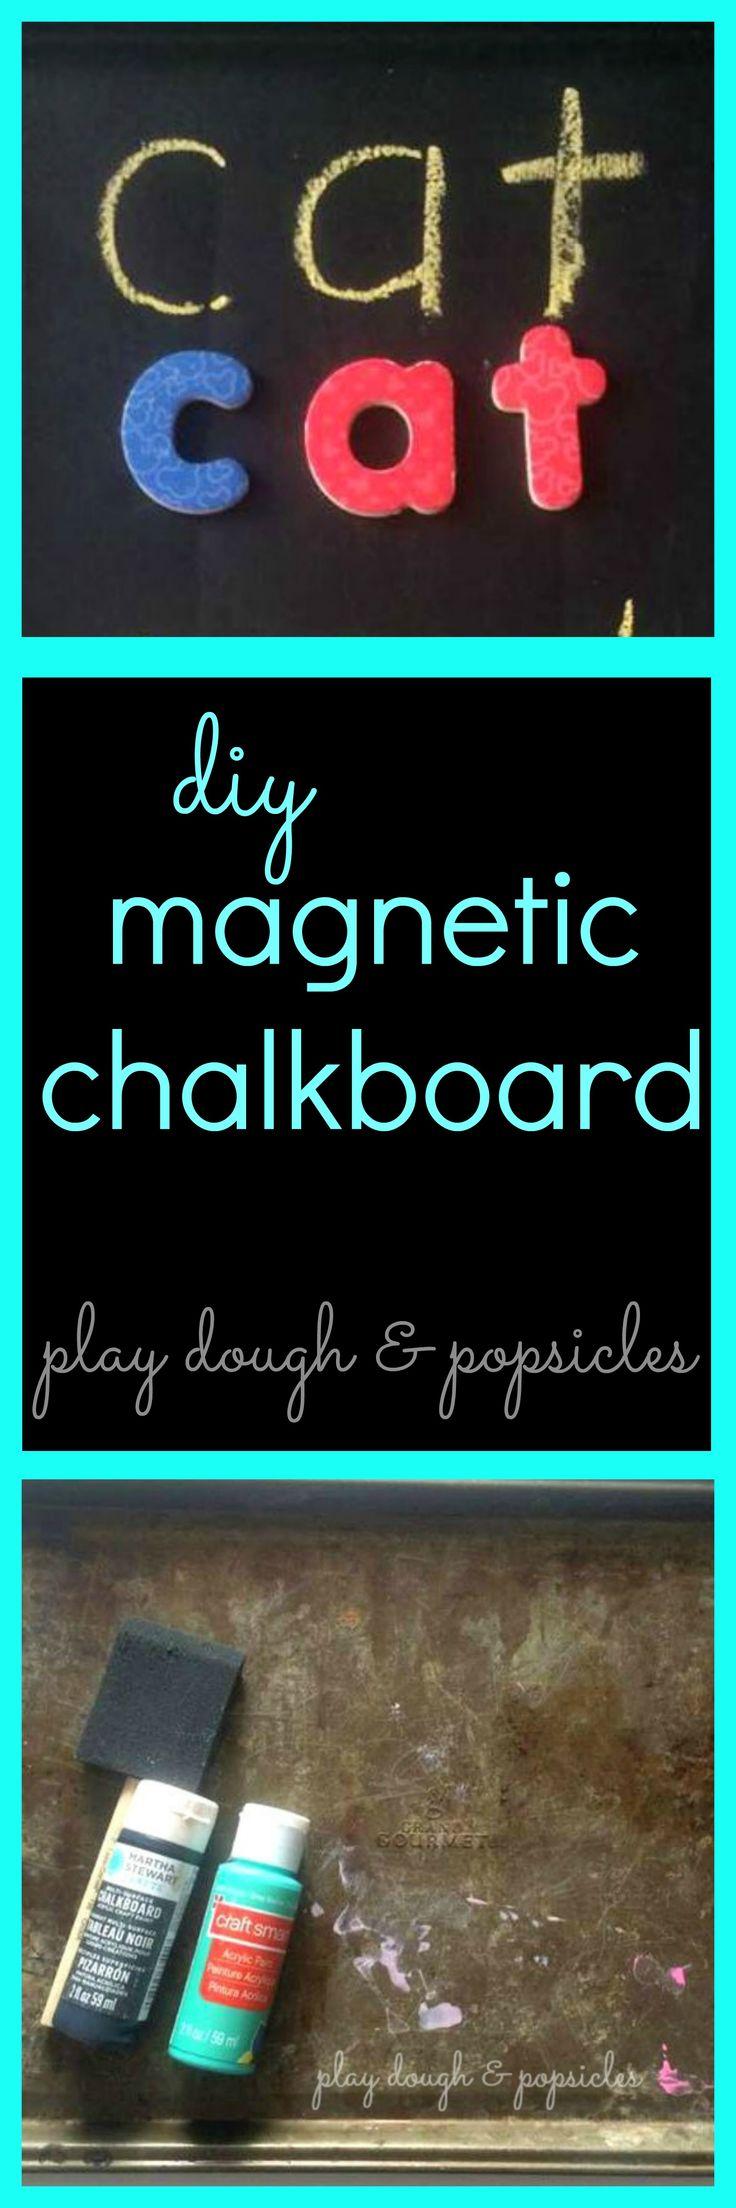 DIY Magnetic Chalkboard for kids or adults. use in kitchen, menu board, or preschool tool for kids.